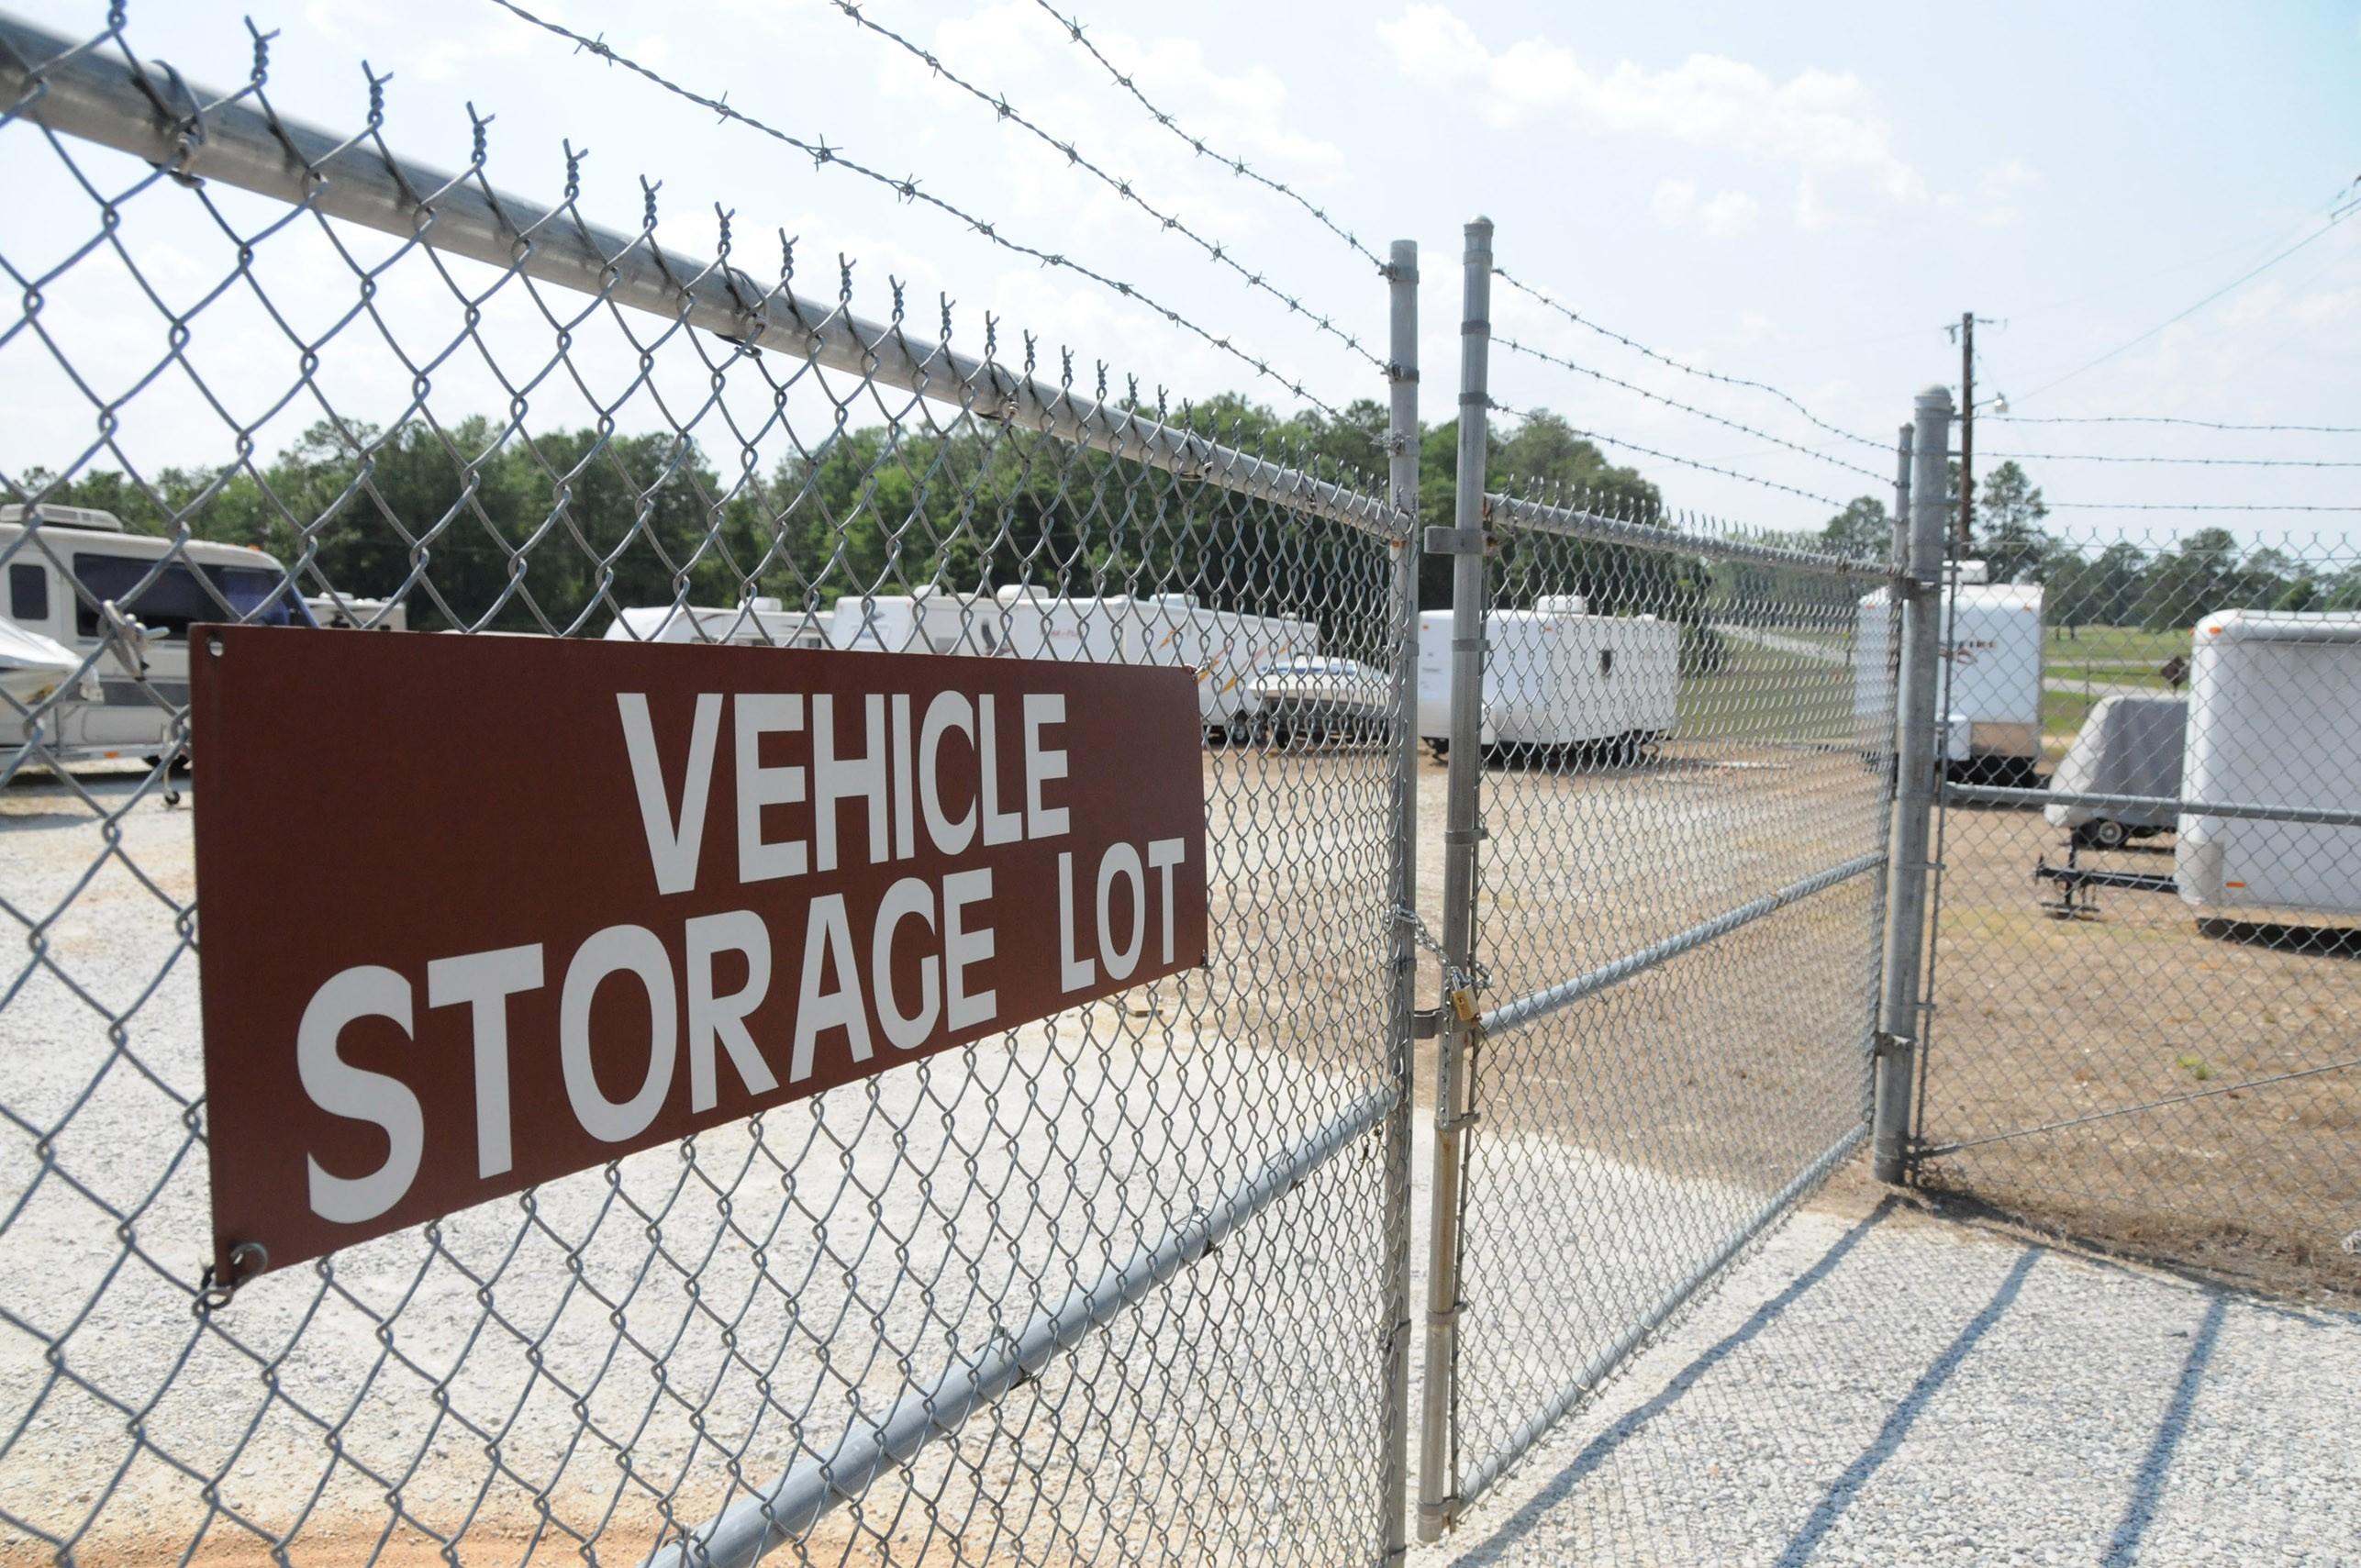 Fort Rucker Rv Boat Storage Policies Change Article